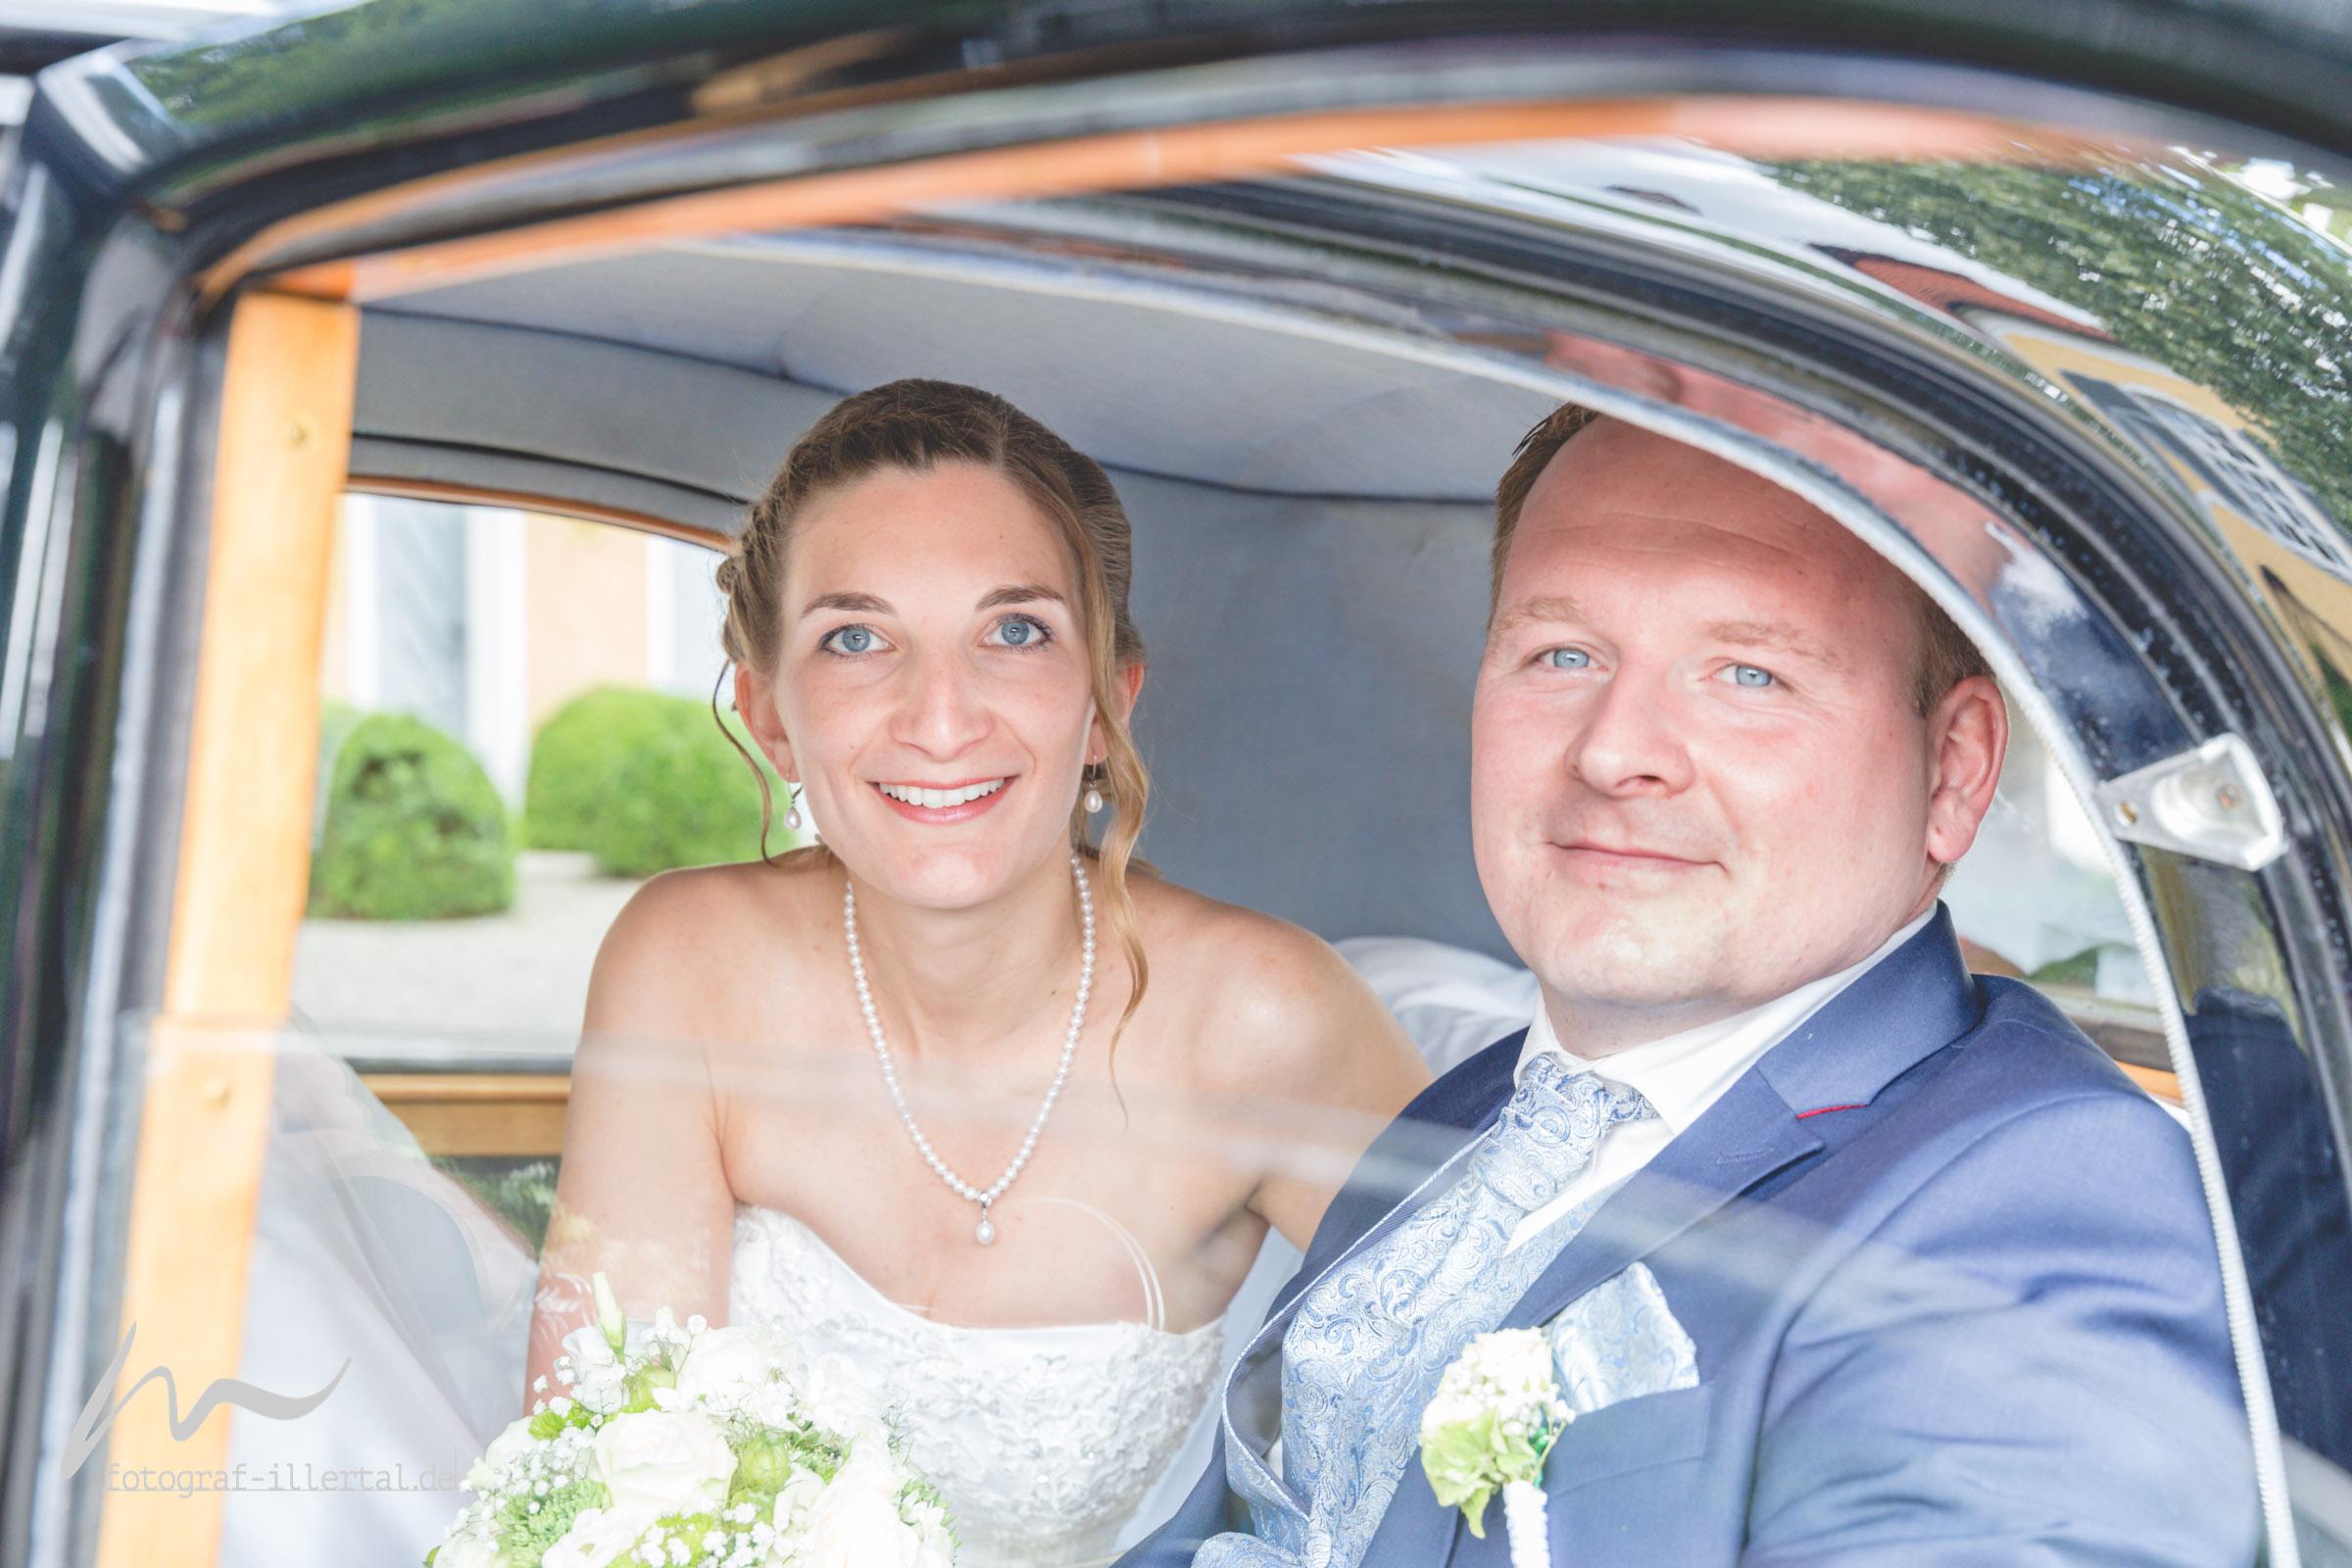 Fotograf Illertal-Christian Miller-Hochzeitsfotografie-_MG_3464